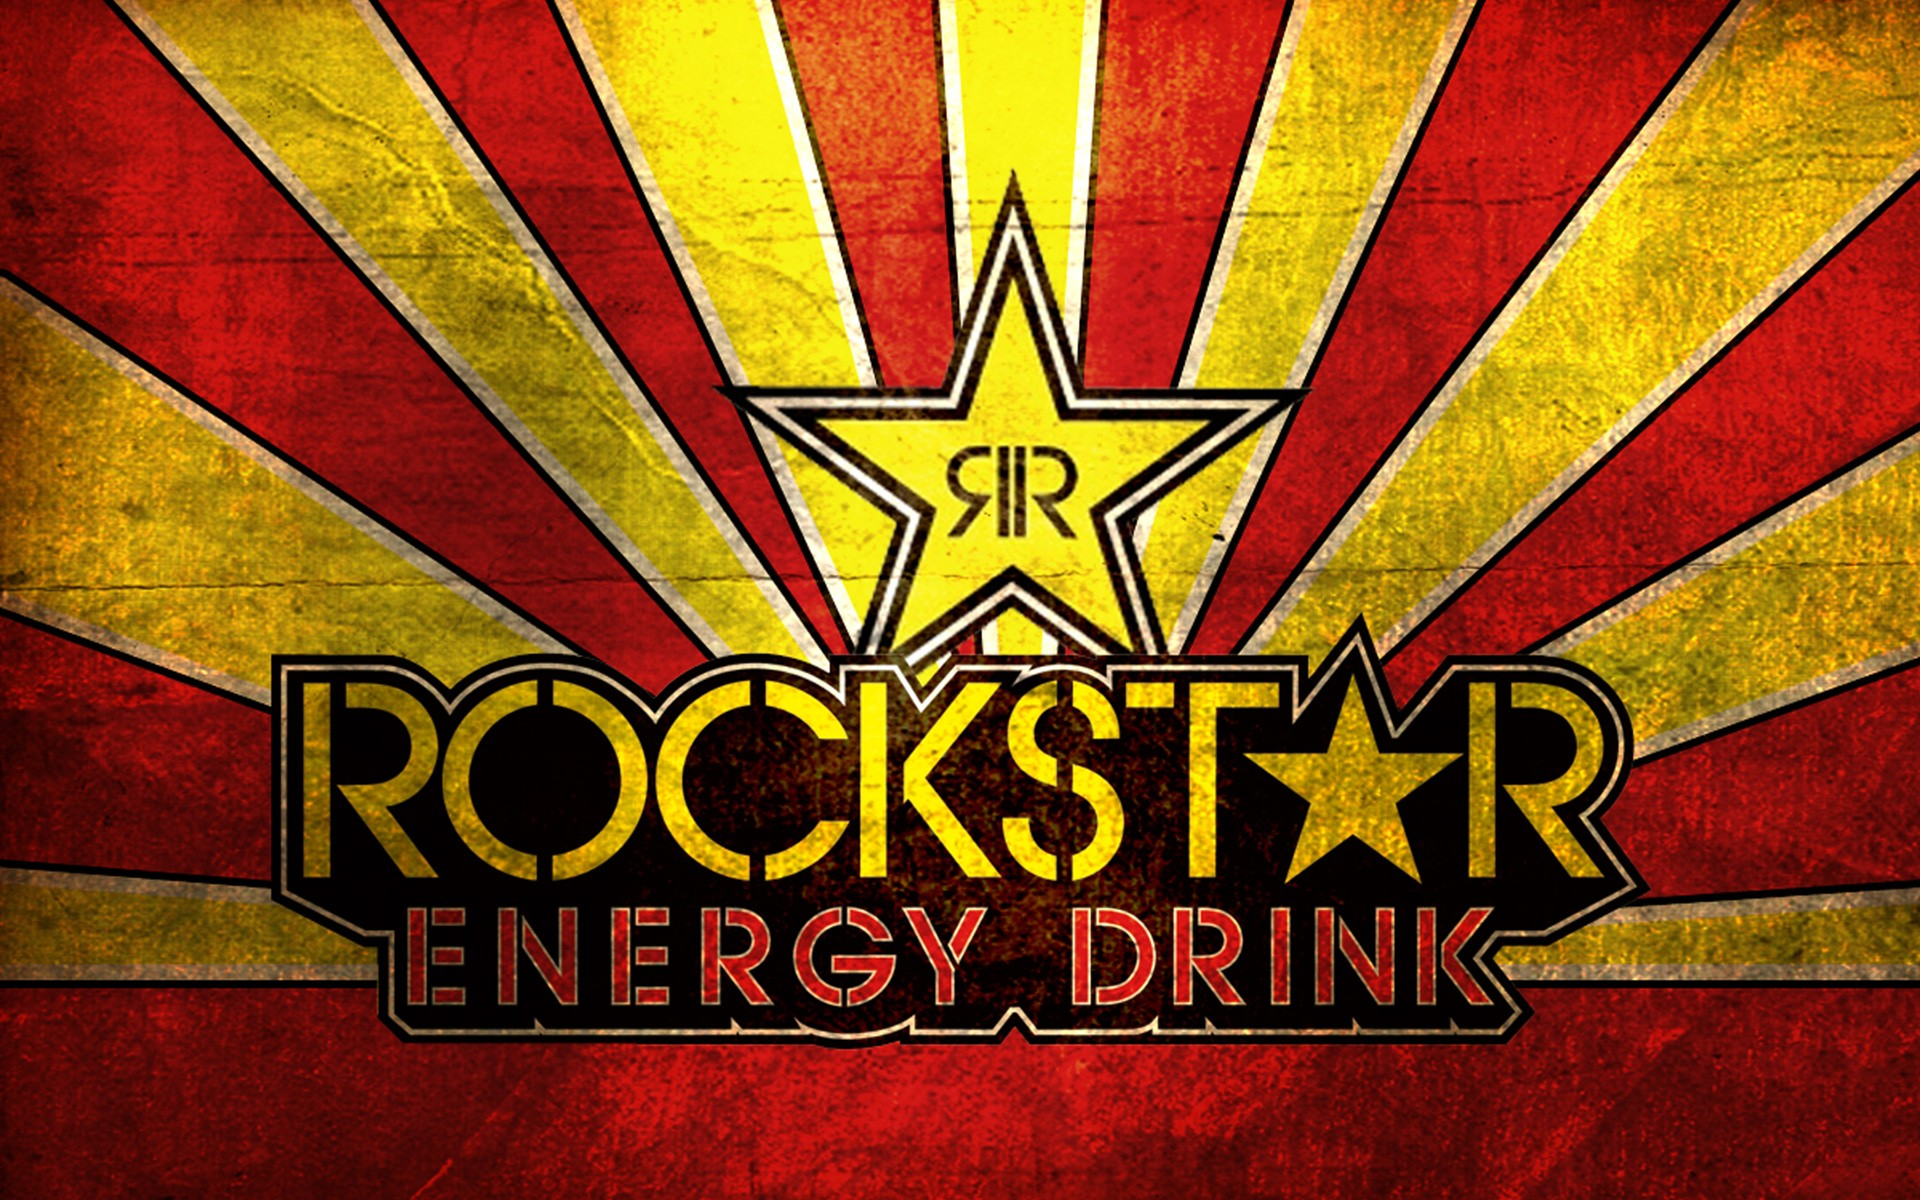 Rockstar Energy Wallpaper 1920x1200 Rockstar Energy Drink 1920x1200